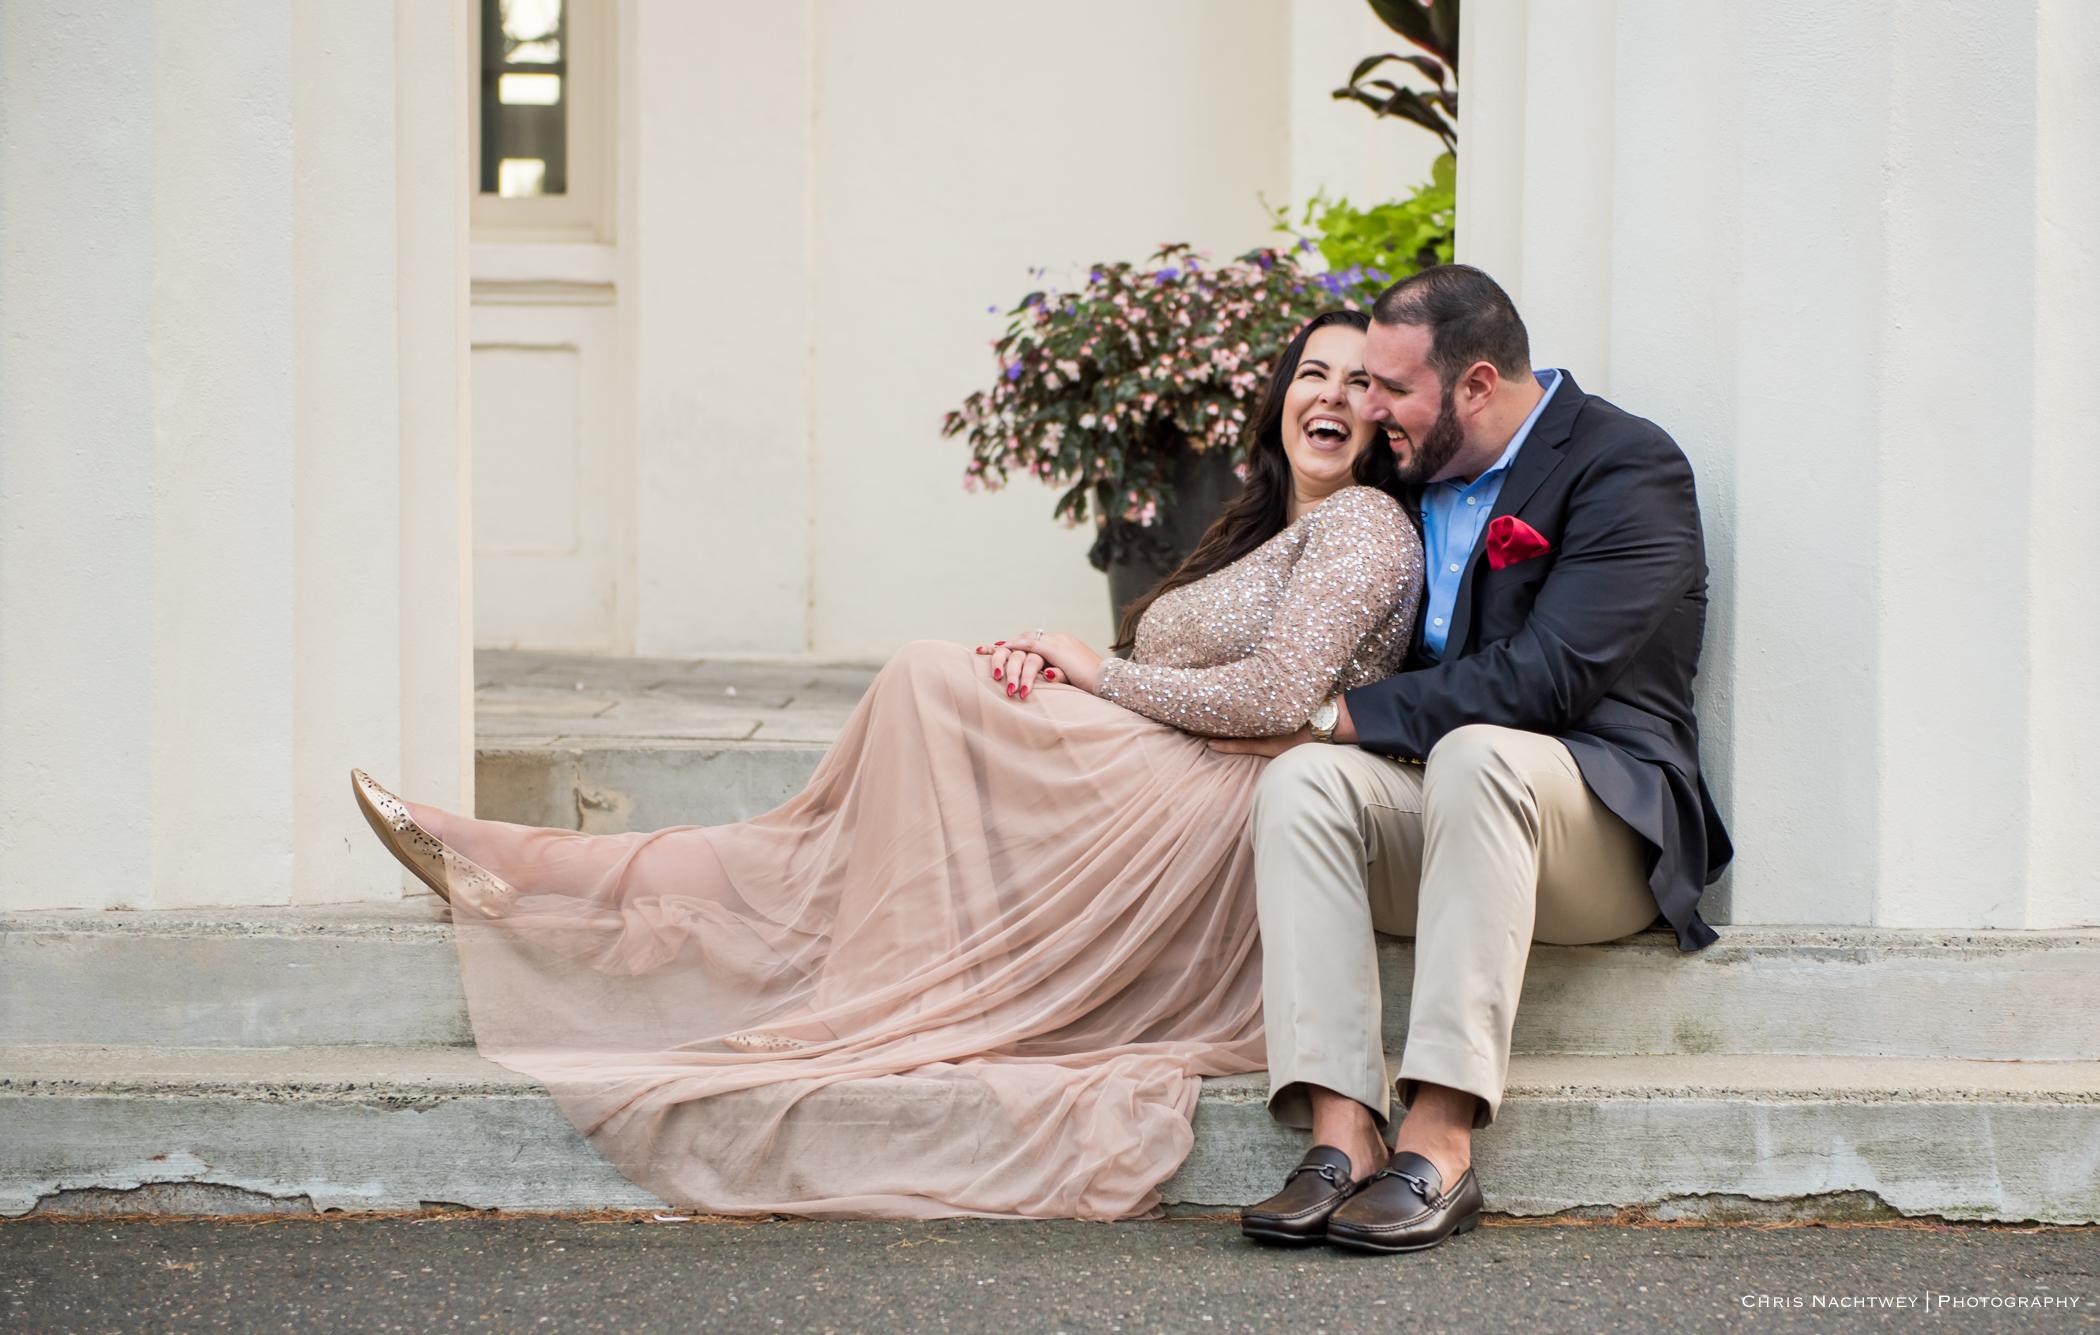 engagement-photos-wadsworth-mansion-ct-chris-nachtwey-photography-2017-10.jpg